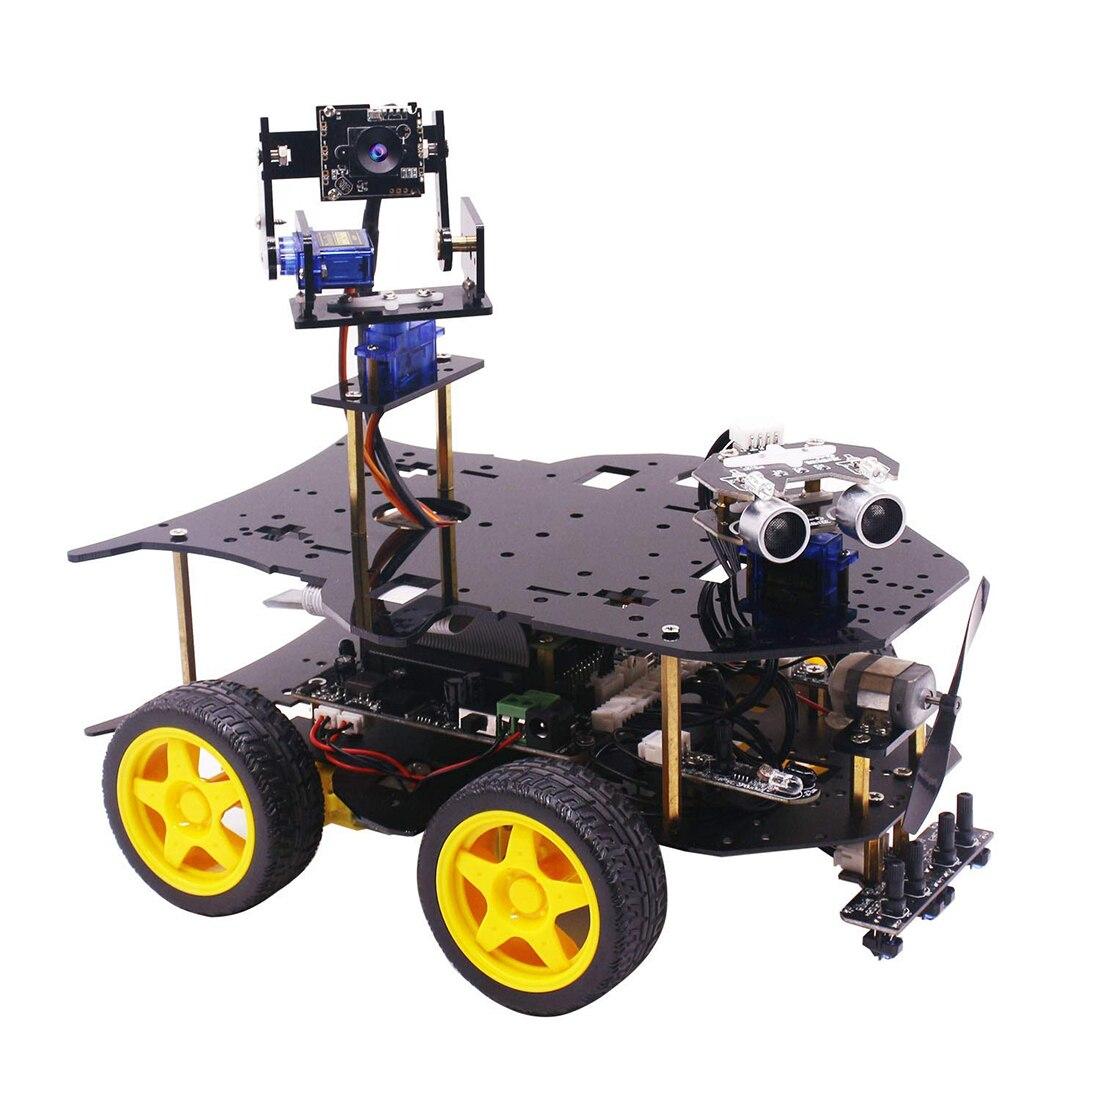 Ultimate Starter Kit voor Raspberry Pi 3 B + HD Camera Programmeerbare Smart Robot Car Kit met 4WD Elektronica Onderwijs-in Professioneel Speelgoed van Speelgoed & Hobbies op  Groep 1